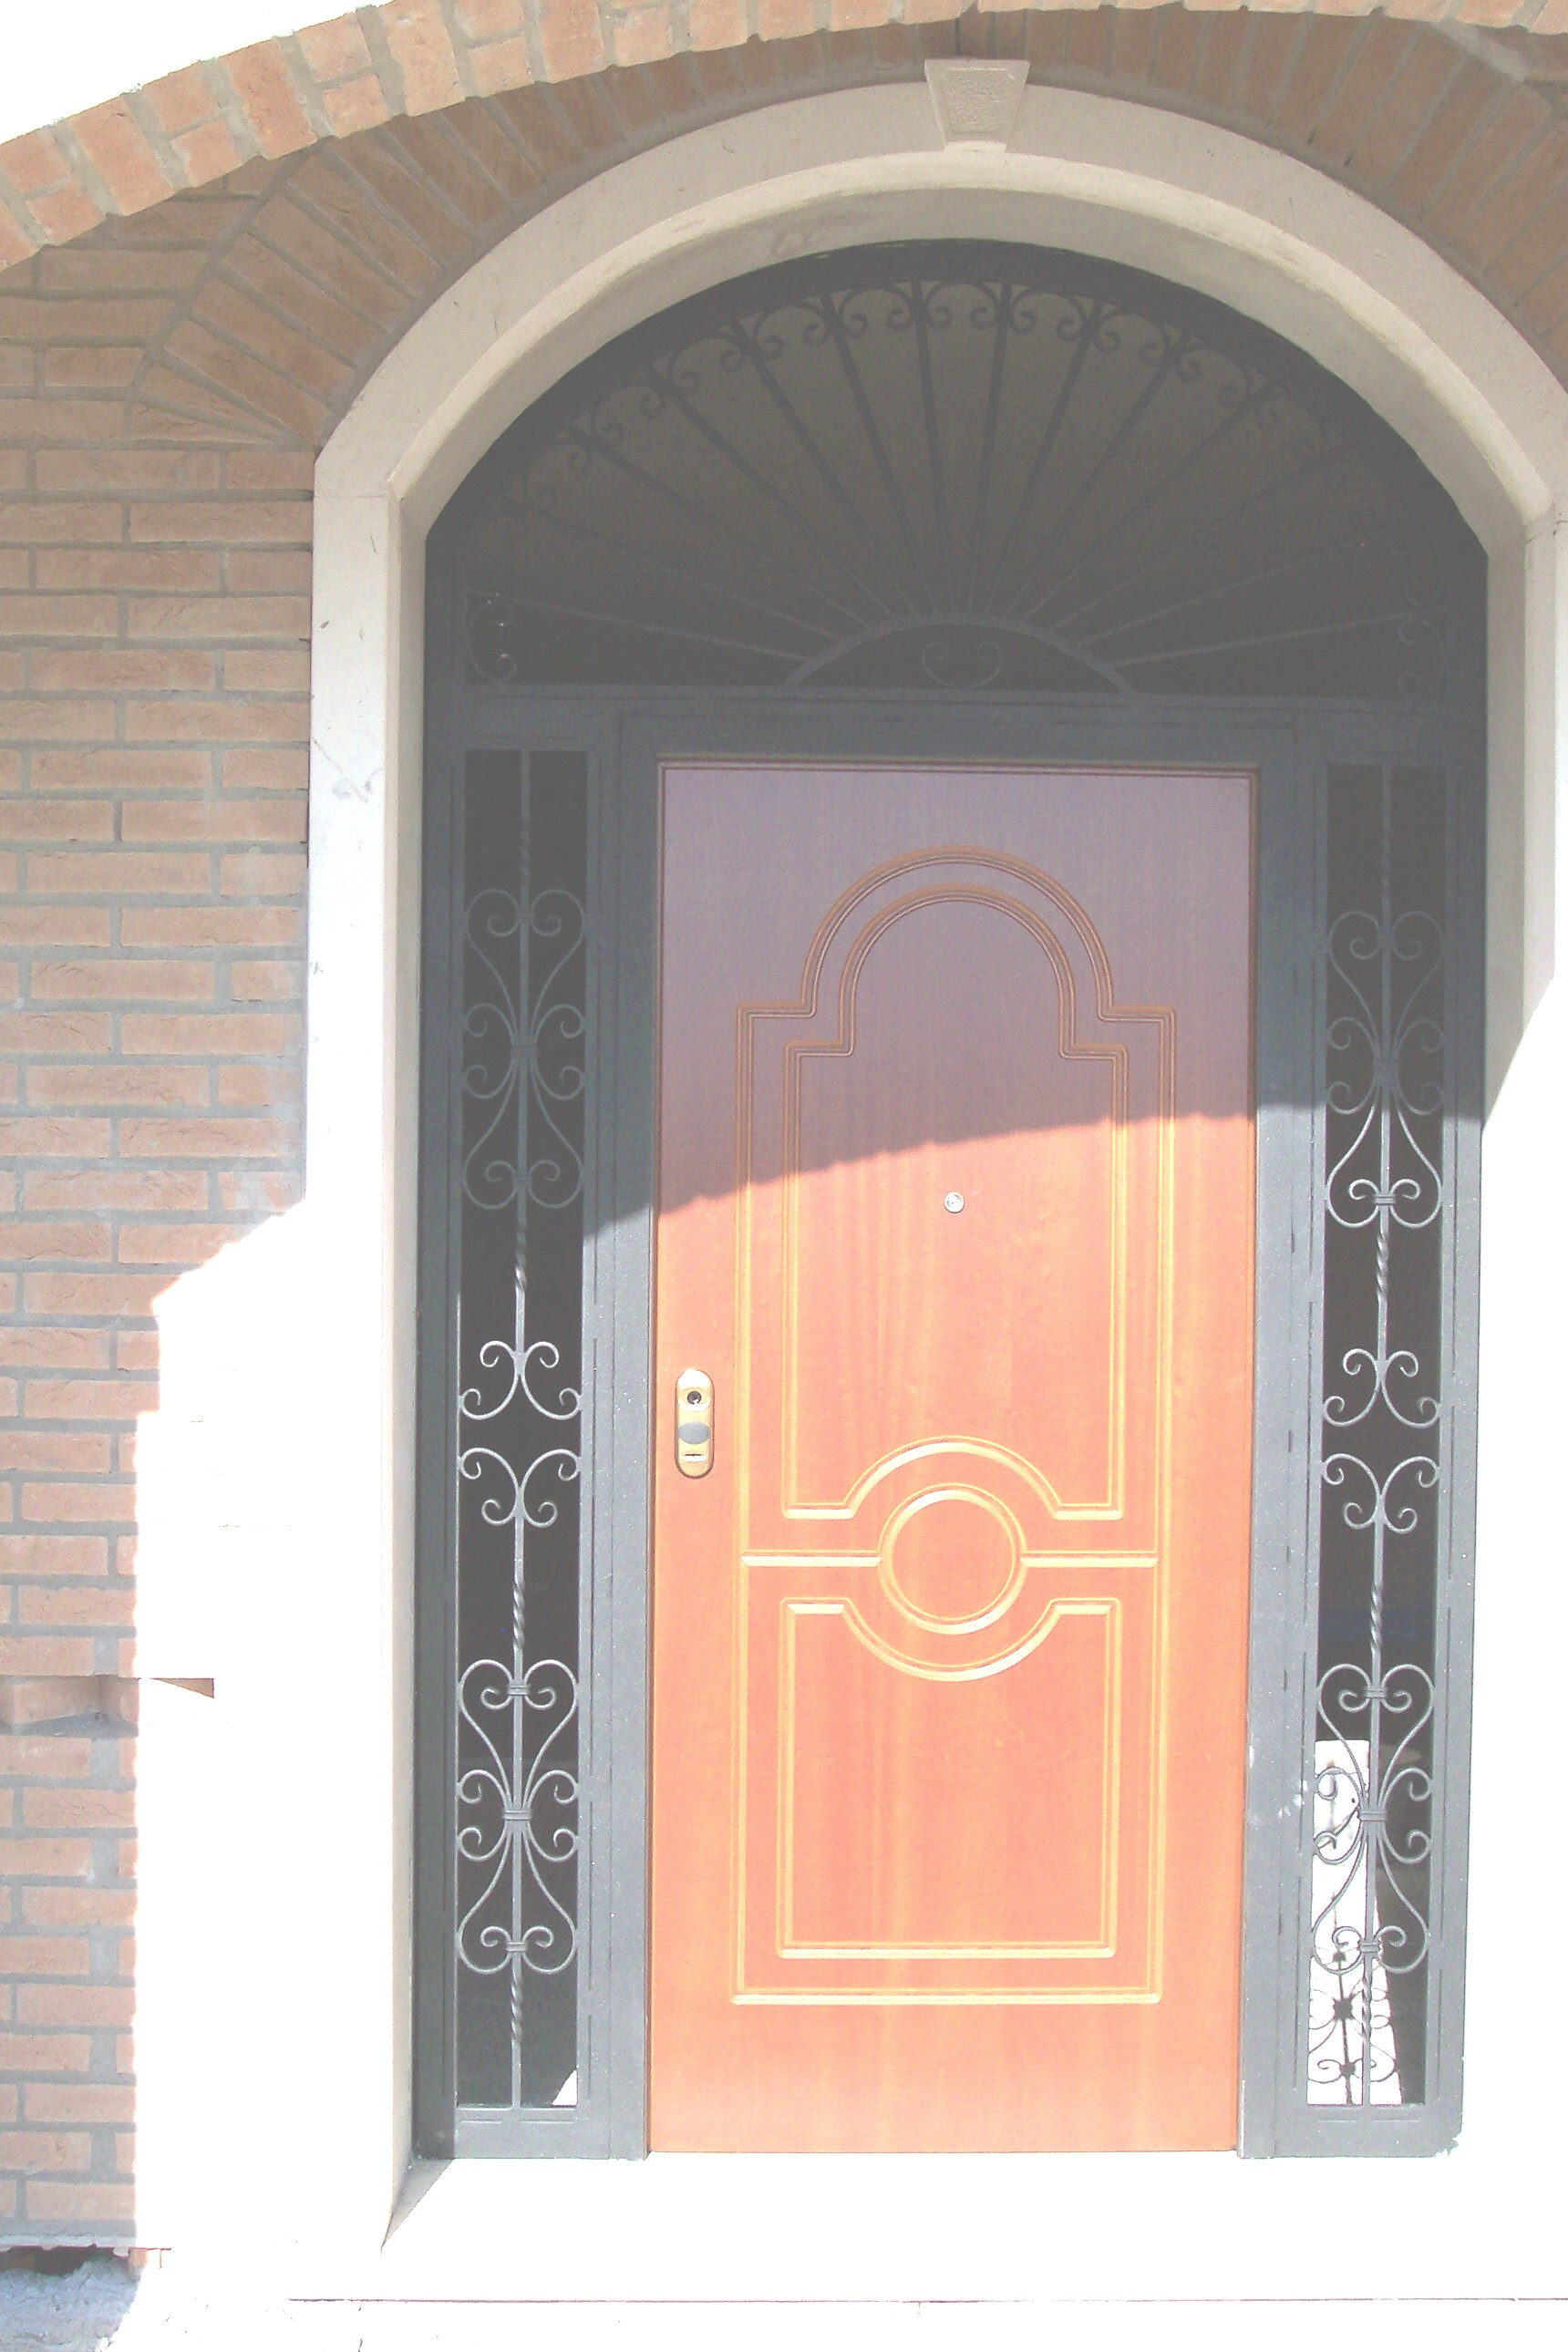 Porte Blindate A Ferrara corbas-ferrara-porte-blindate-000001 - corbas - portomaggiore fe